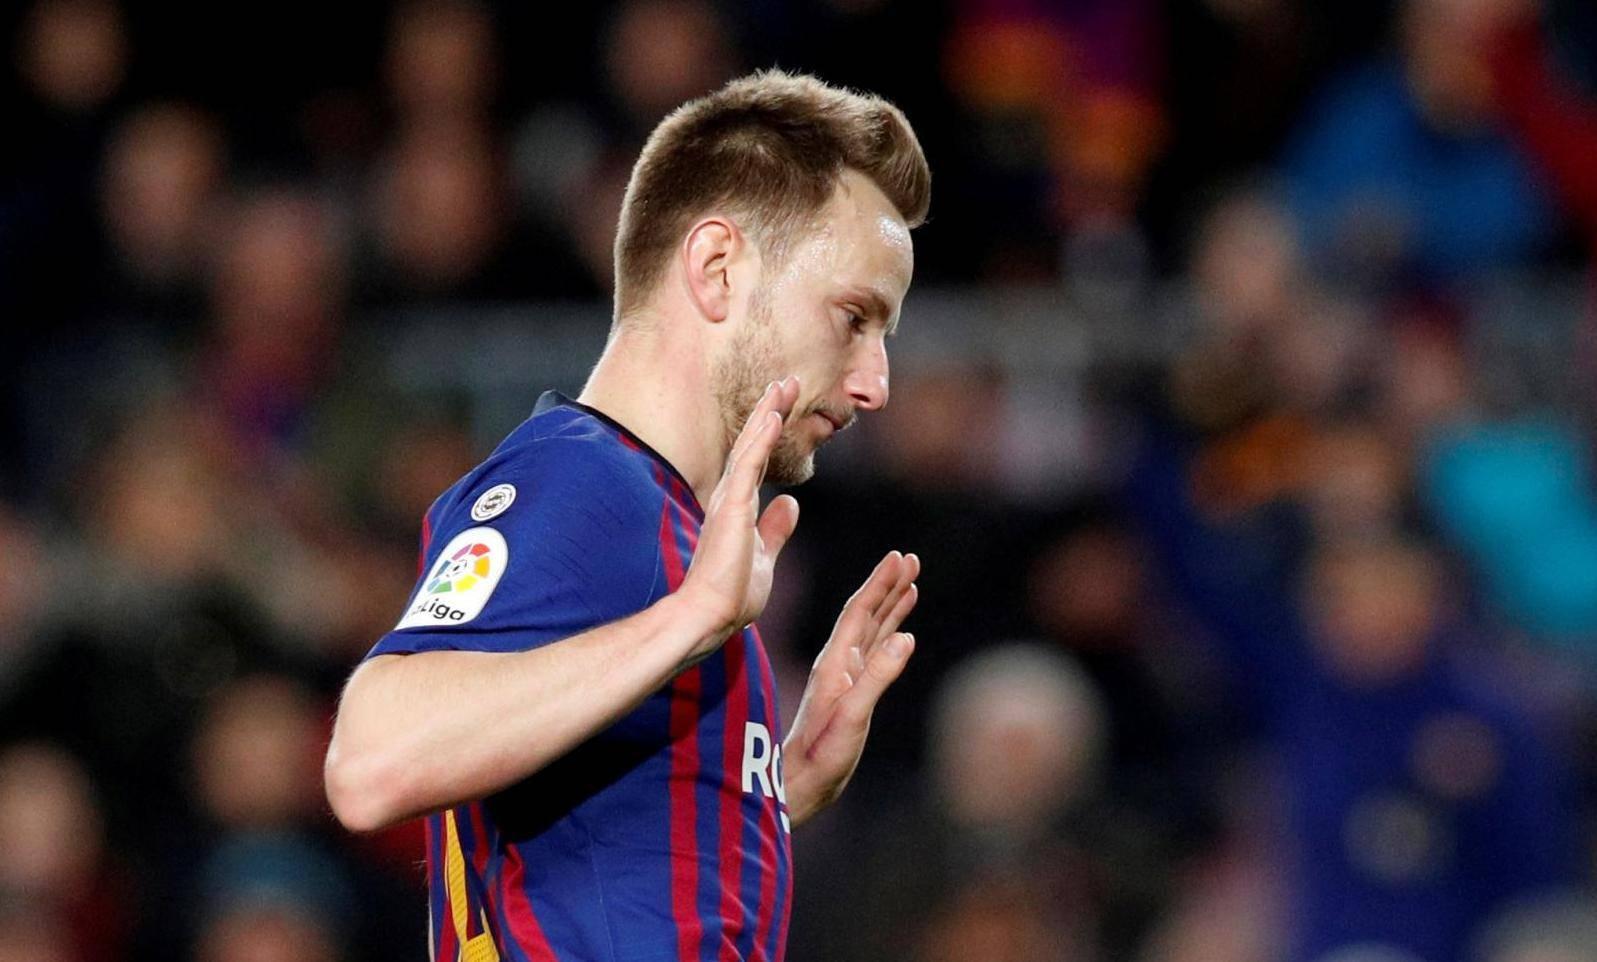 FILE PHOTO: Copa del Rey - Quarter-Final - Second Leg - FC Barcelona v Sevilla